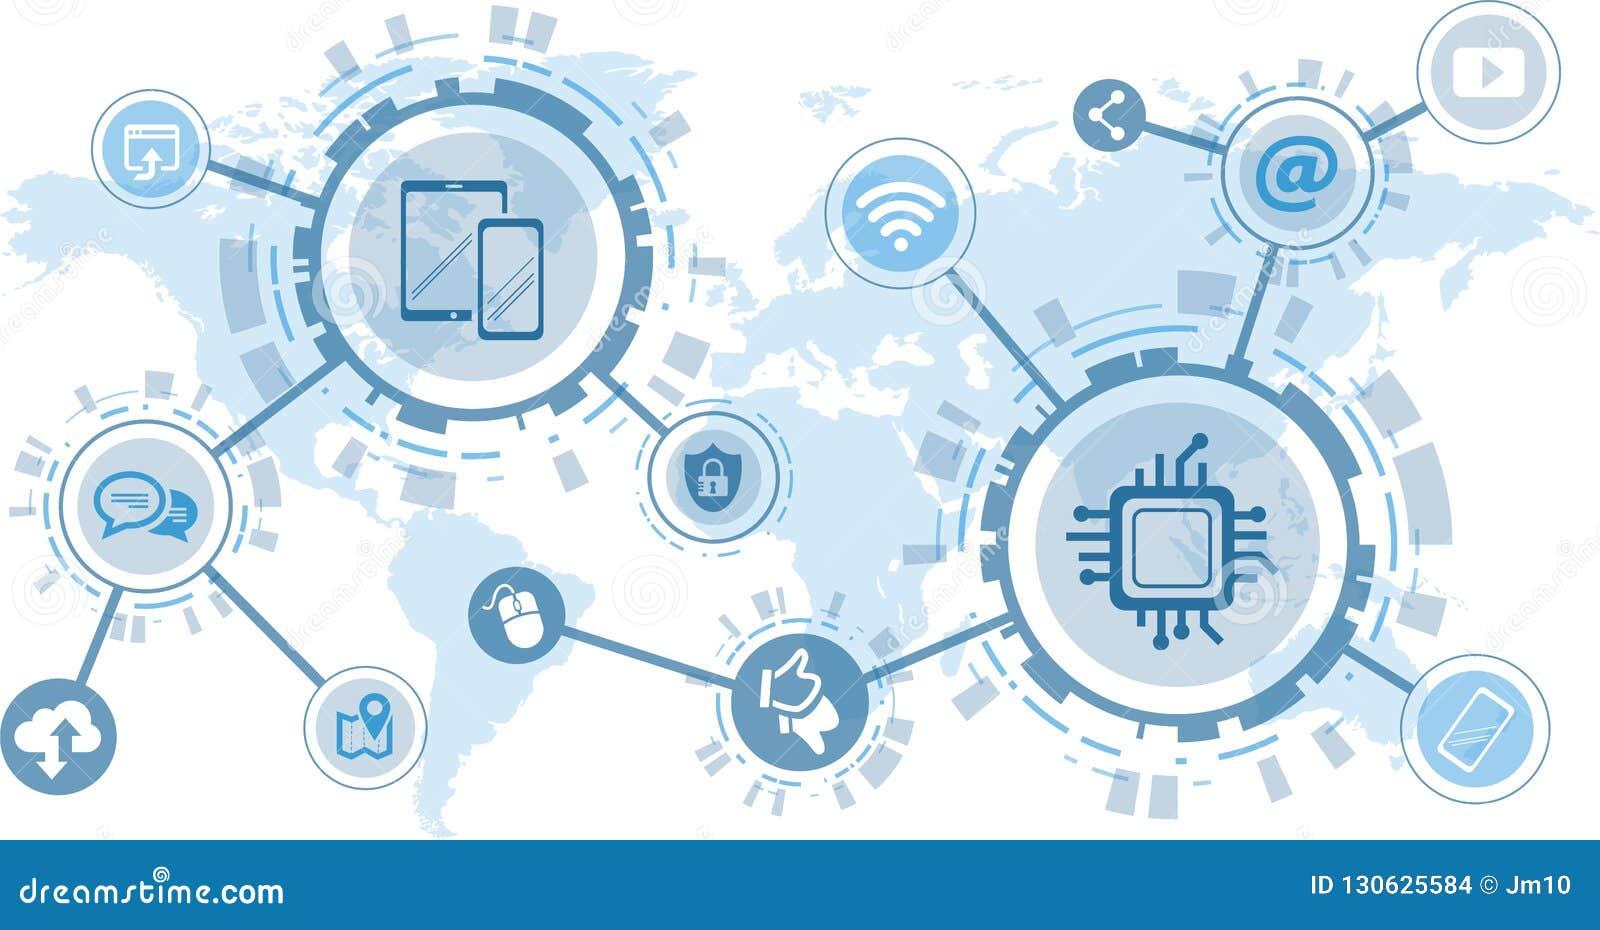 Digitalization and mobile communication concept - vector illustration